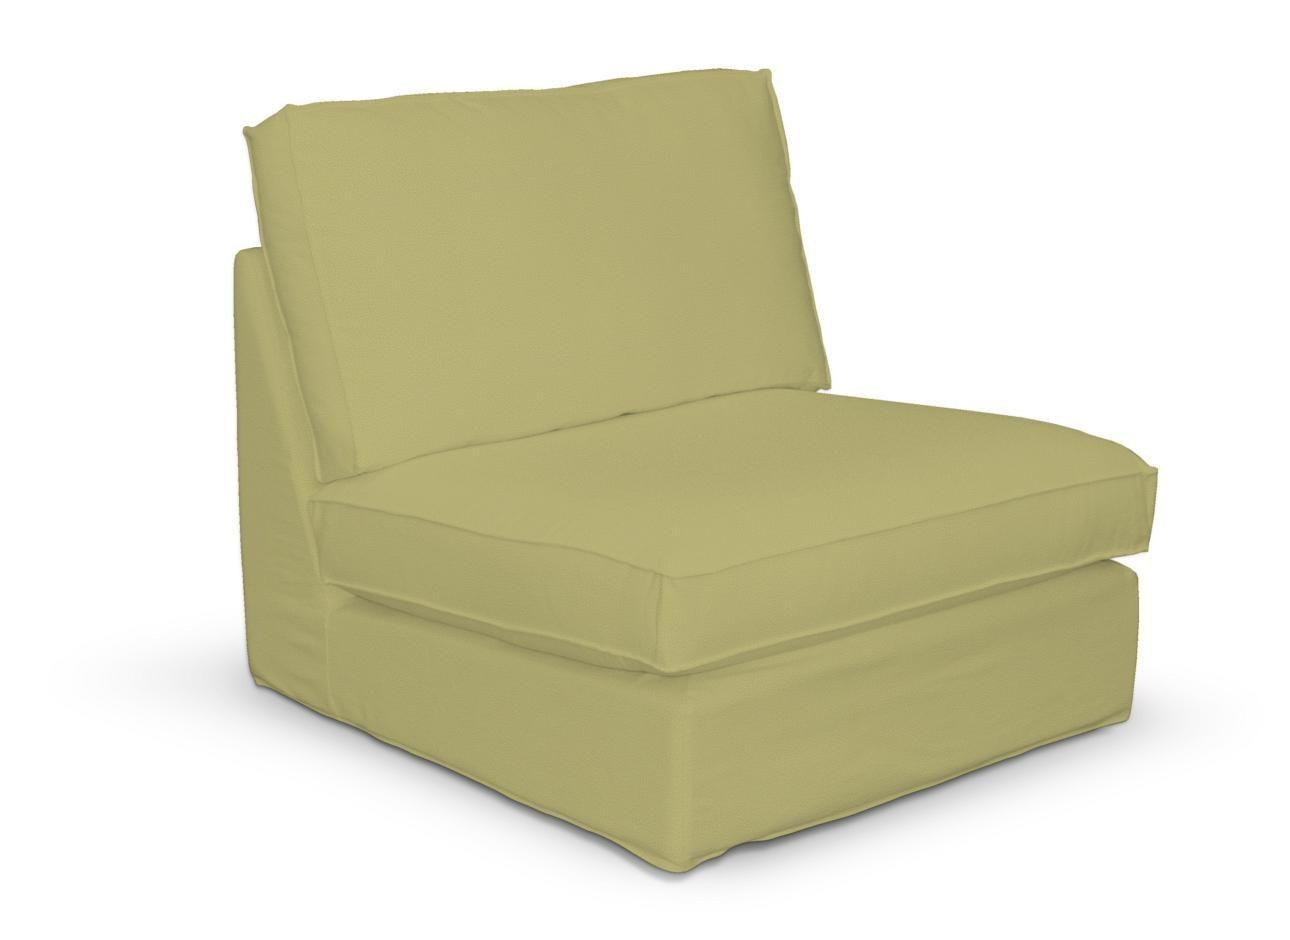 Ledersessel Möbel Sofa Sessel Design | Sessel Möbel | Einzel Sessel Design  | Couch Mit Ohrensessel